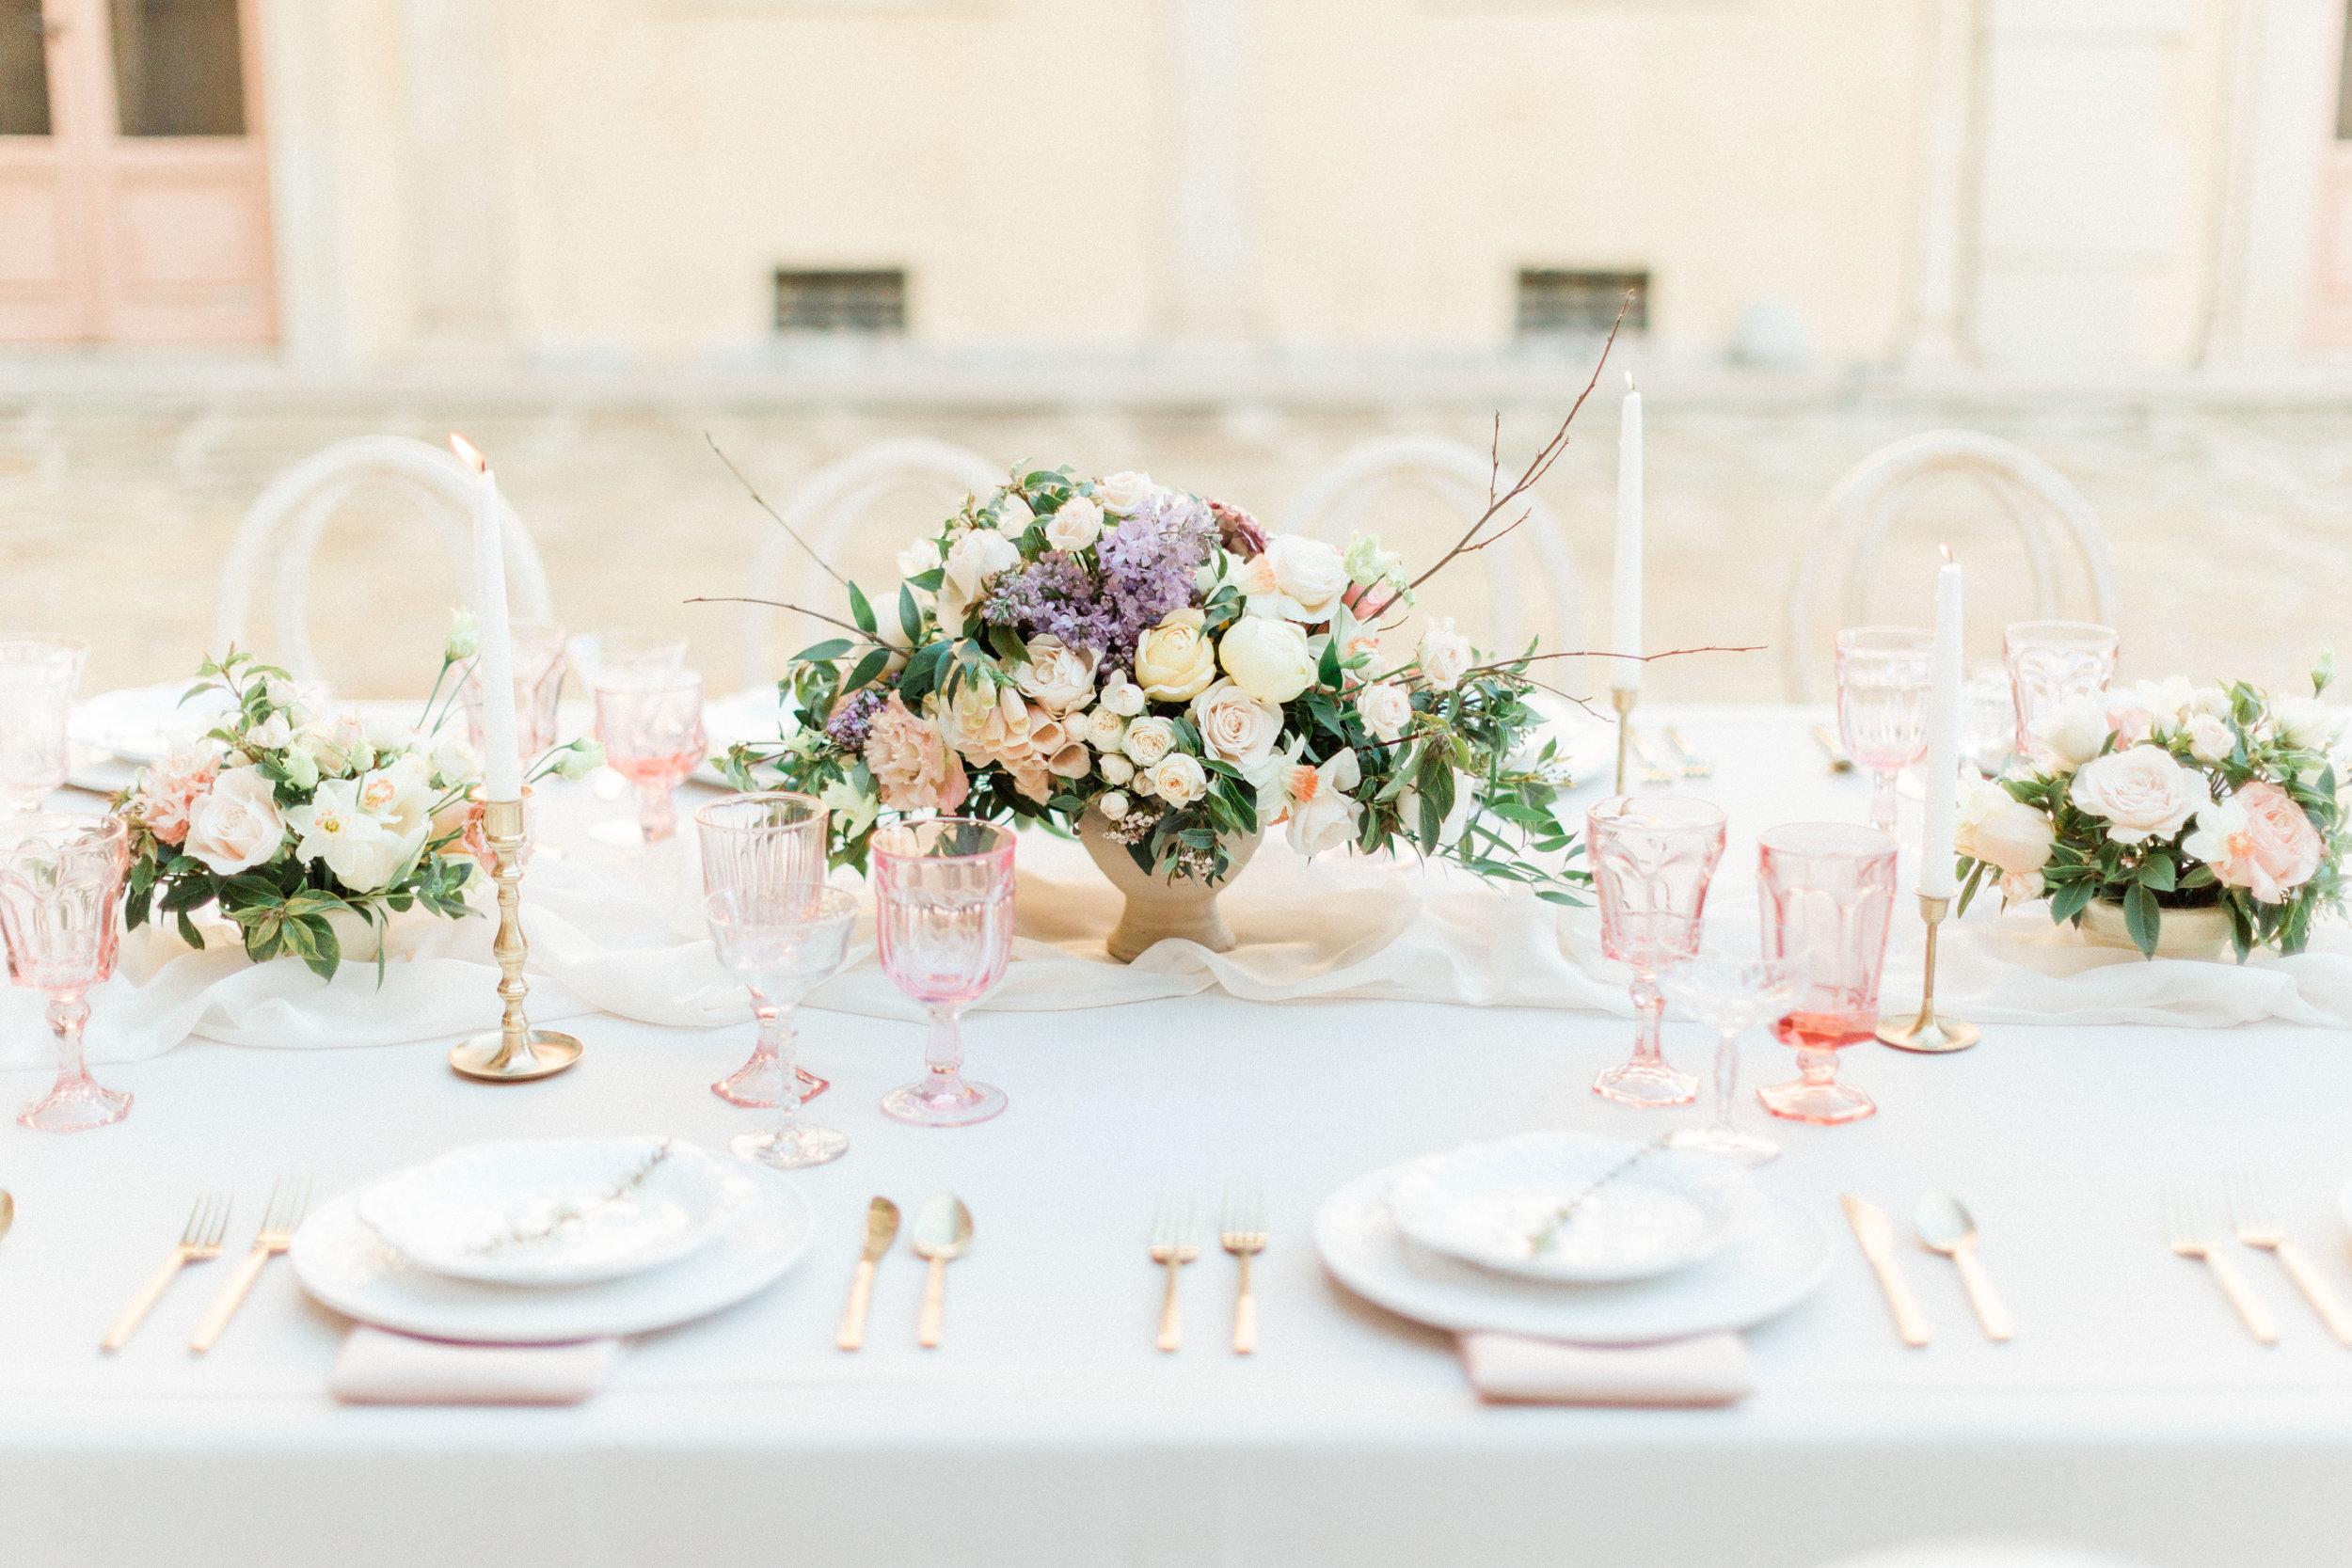 Garden_Style_Lush_Florals_Tablescape_Sibyl_Sophia_Des_Moines_Iowa.jpg